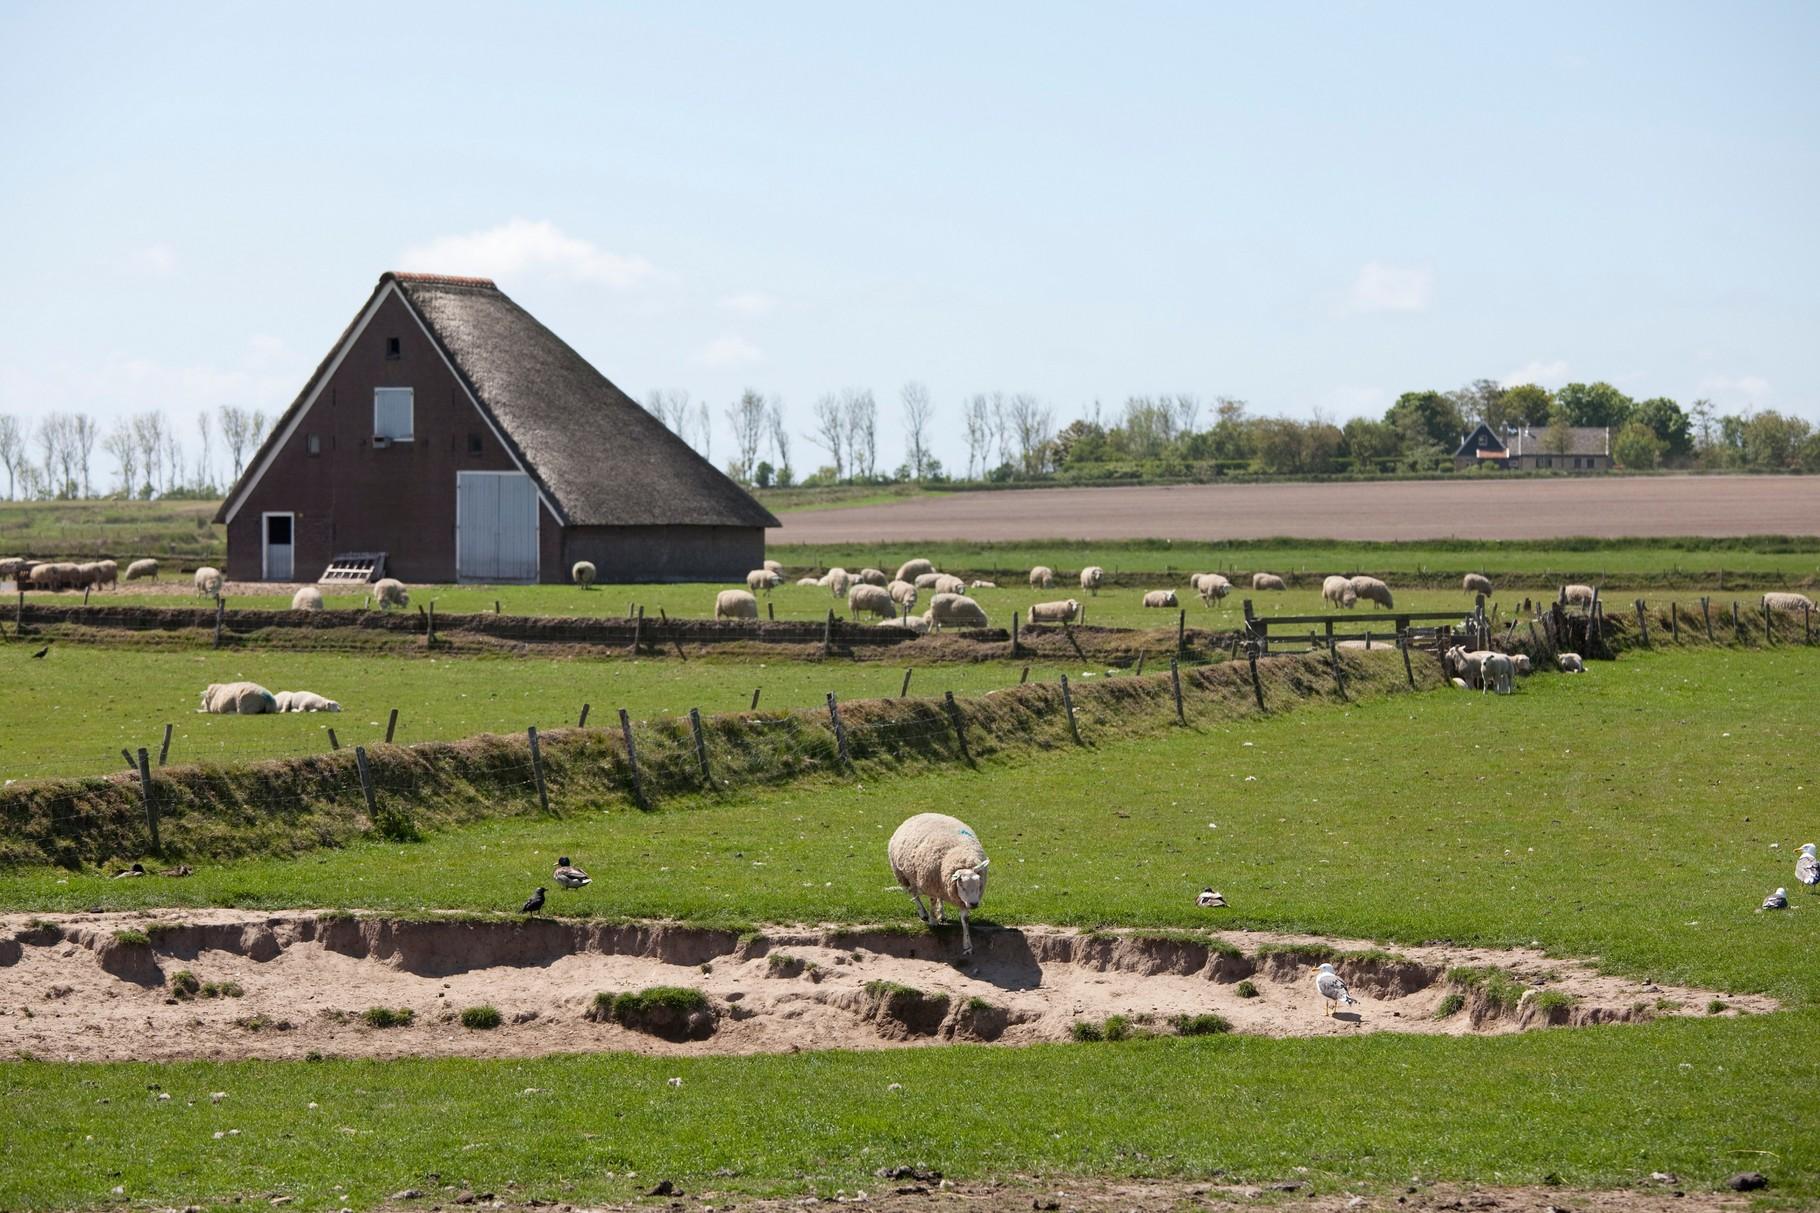 schapenboetkolkfotoTessaJol